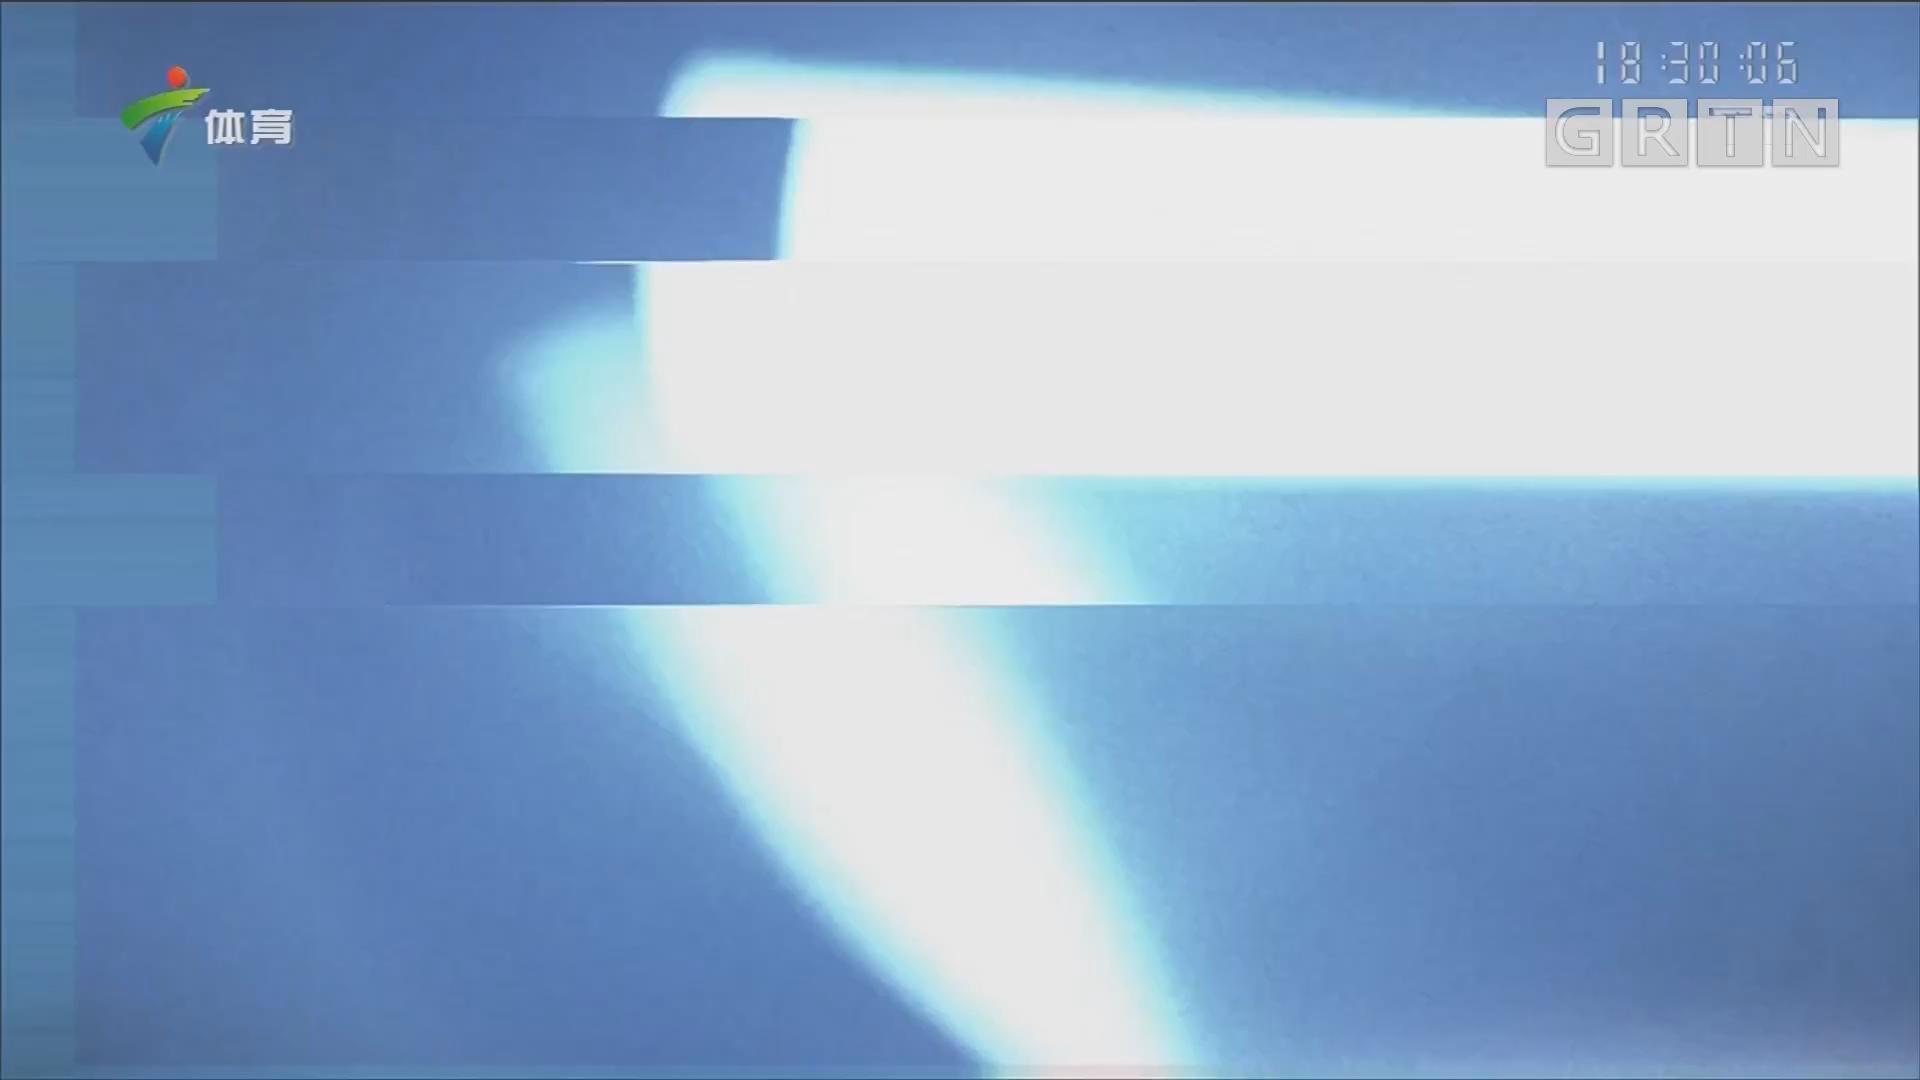 [HD][2019-06-24]体育世界:足球之乡竞风流 梅州球队包揽两项桂冠